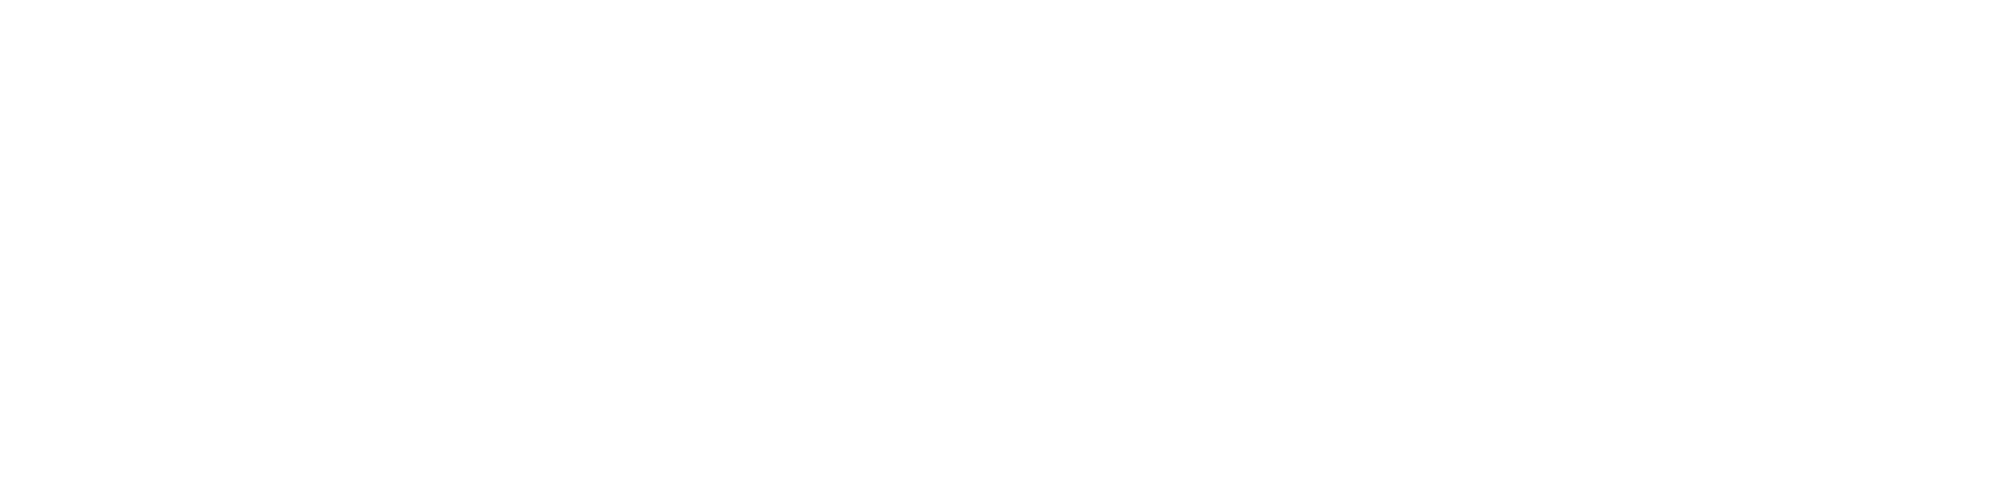 Media relations for Homology Medicines